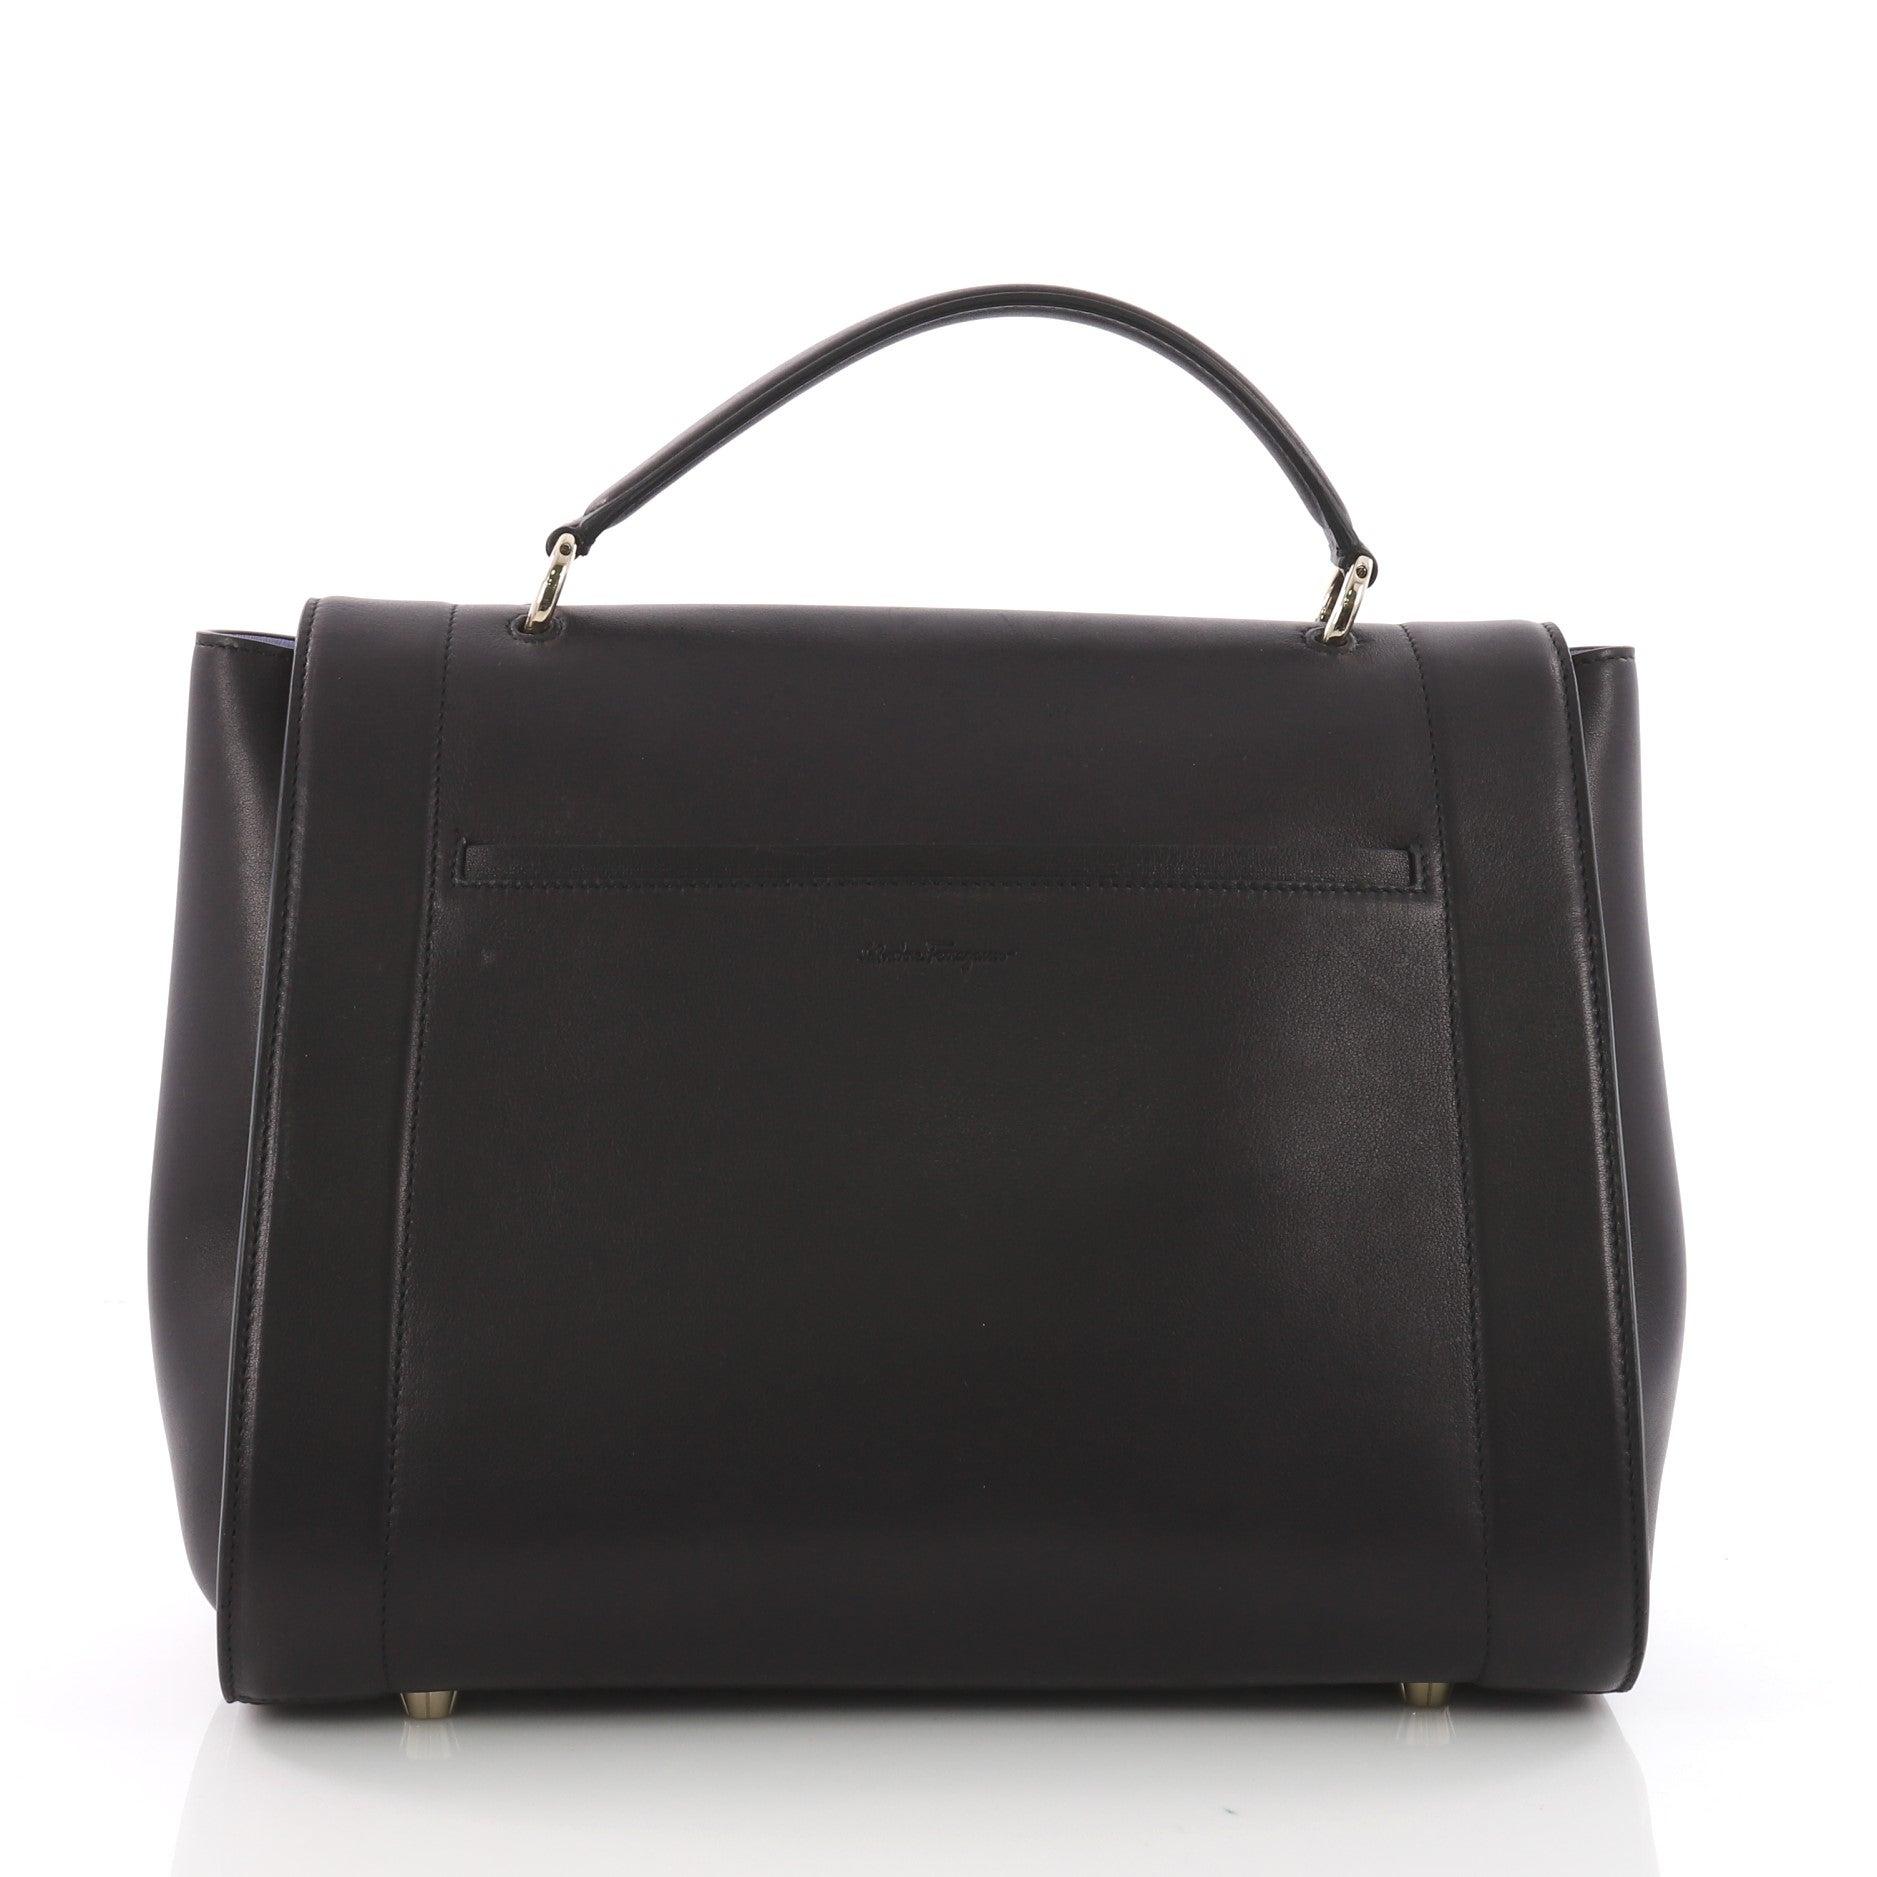 33ad7a675594 Salvatore Ferragamo Sofia Rainbow Saddle Bag Leather Medium at 1stdibs